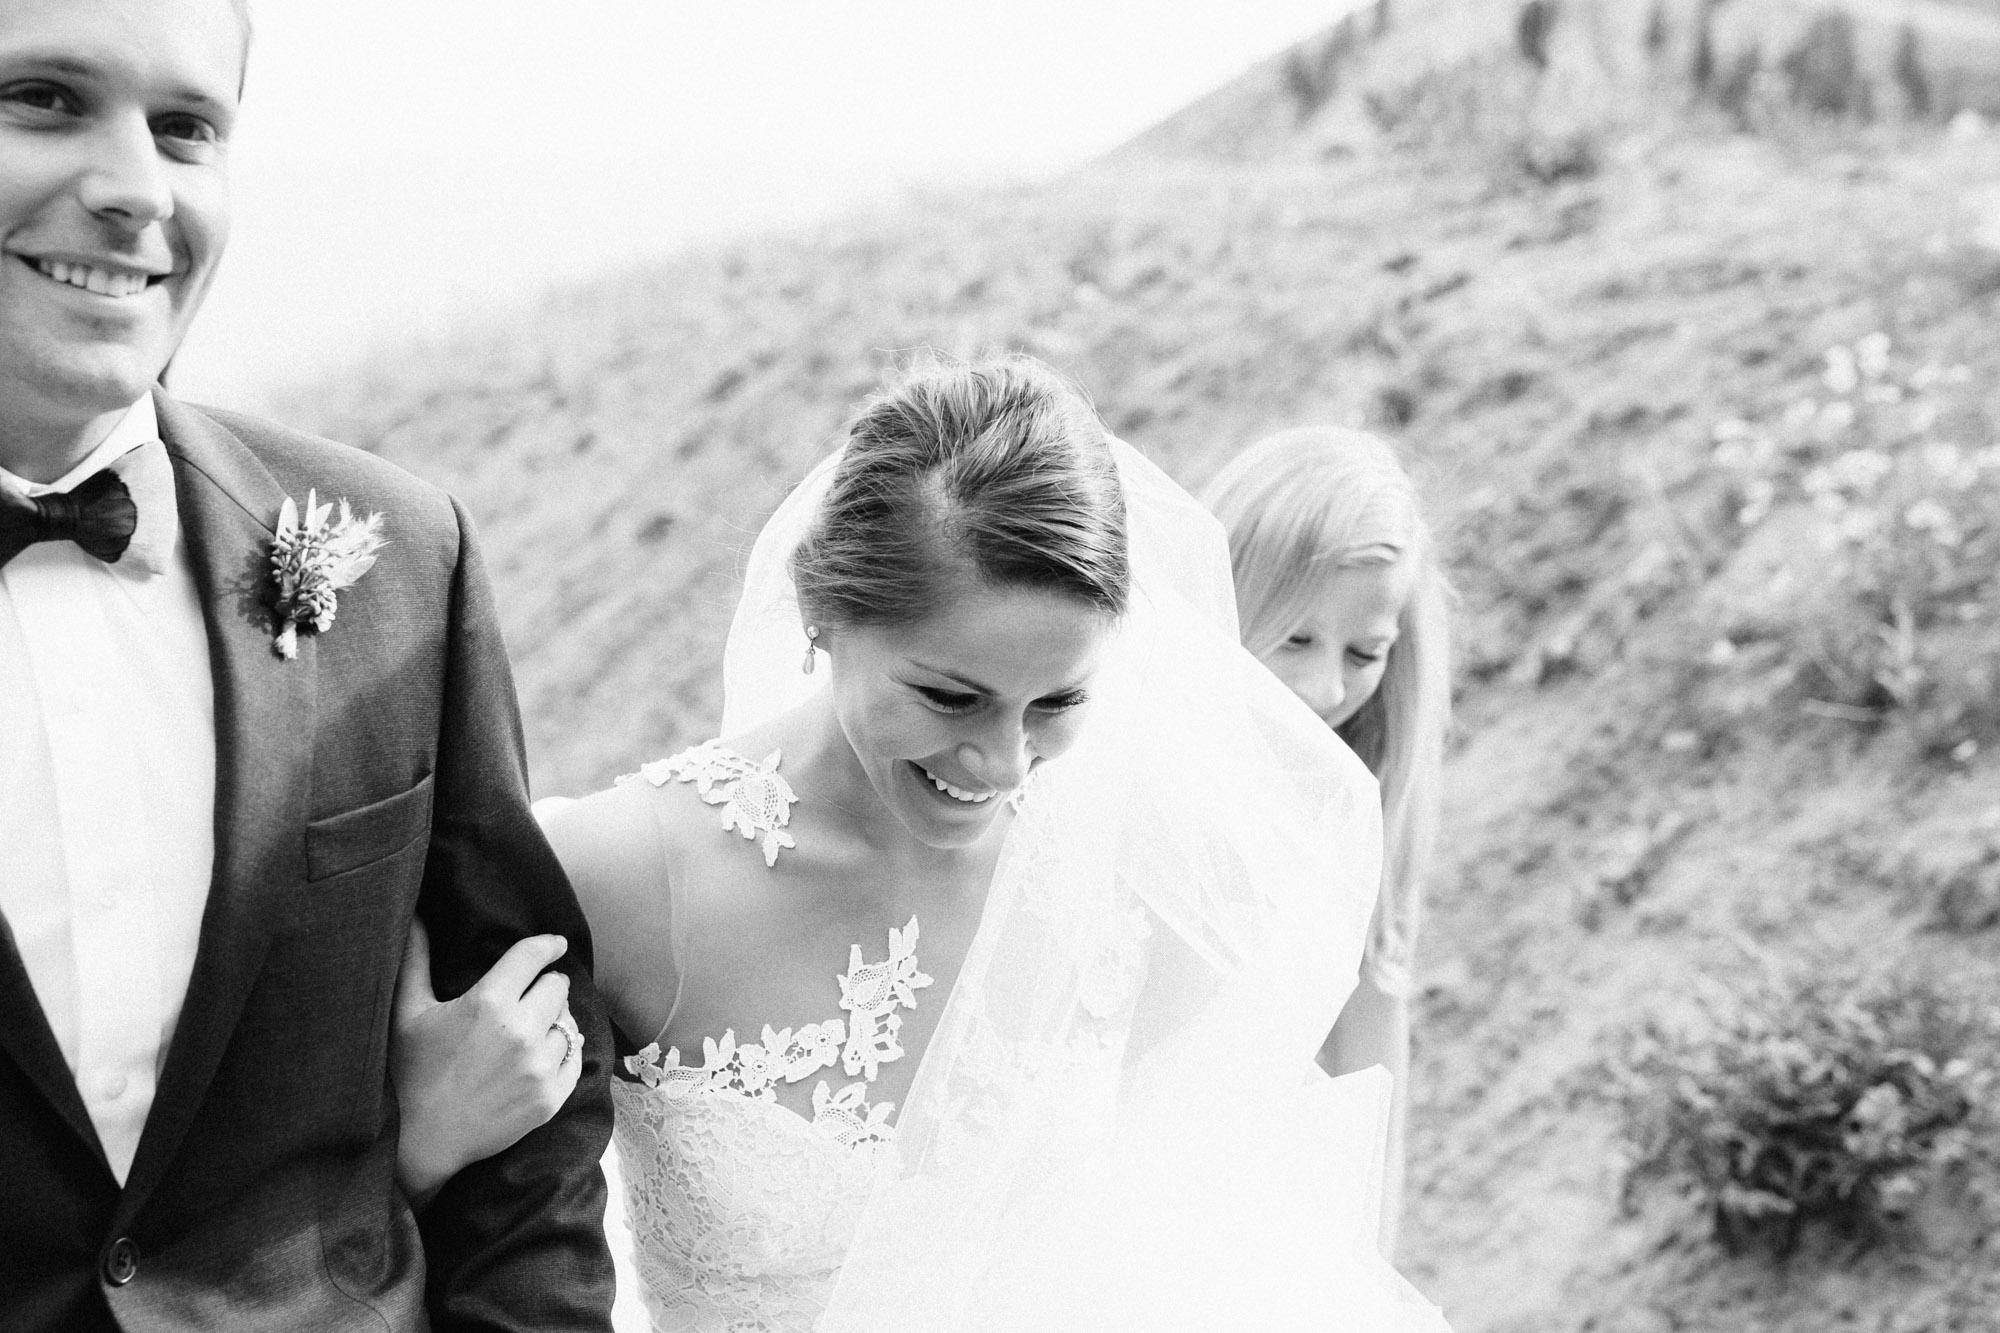 Hannah Hardaway Photography - Wedding and event photography